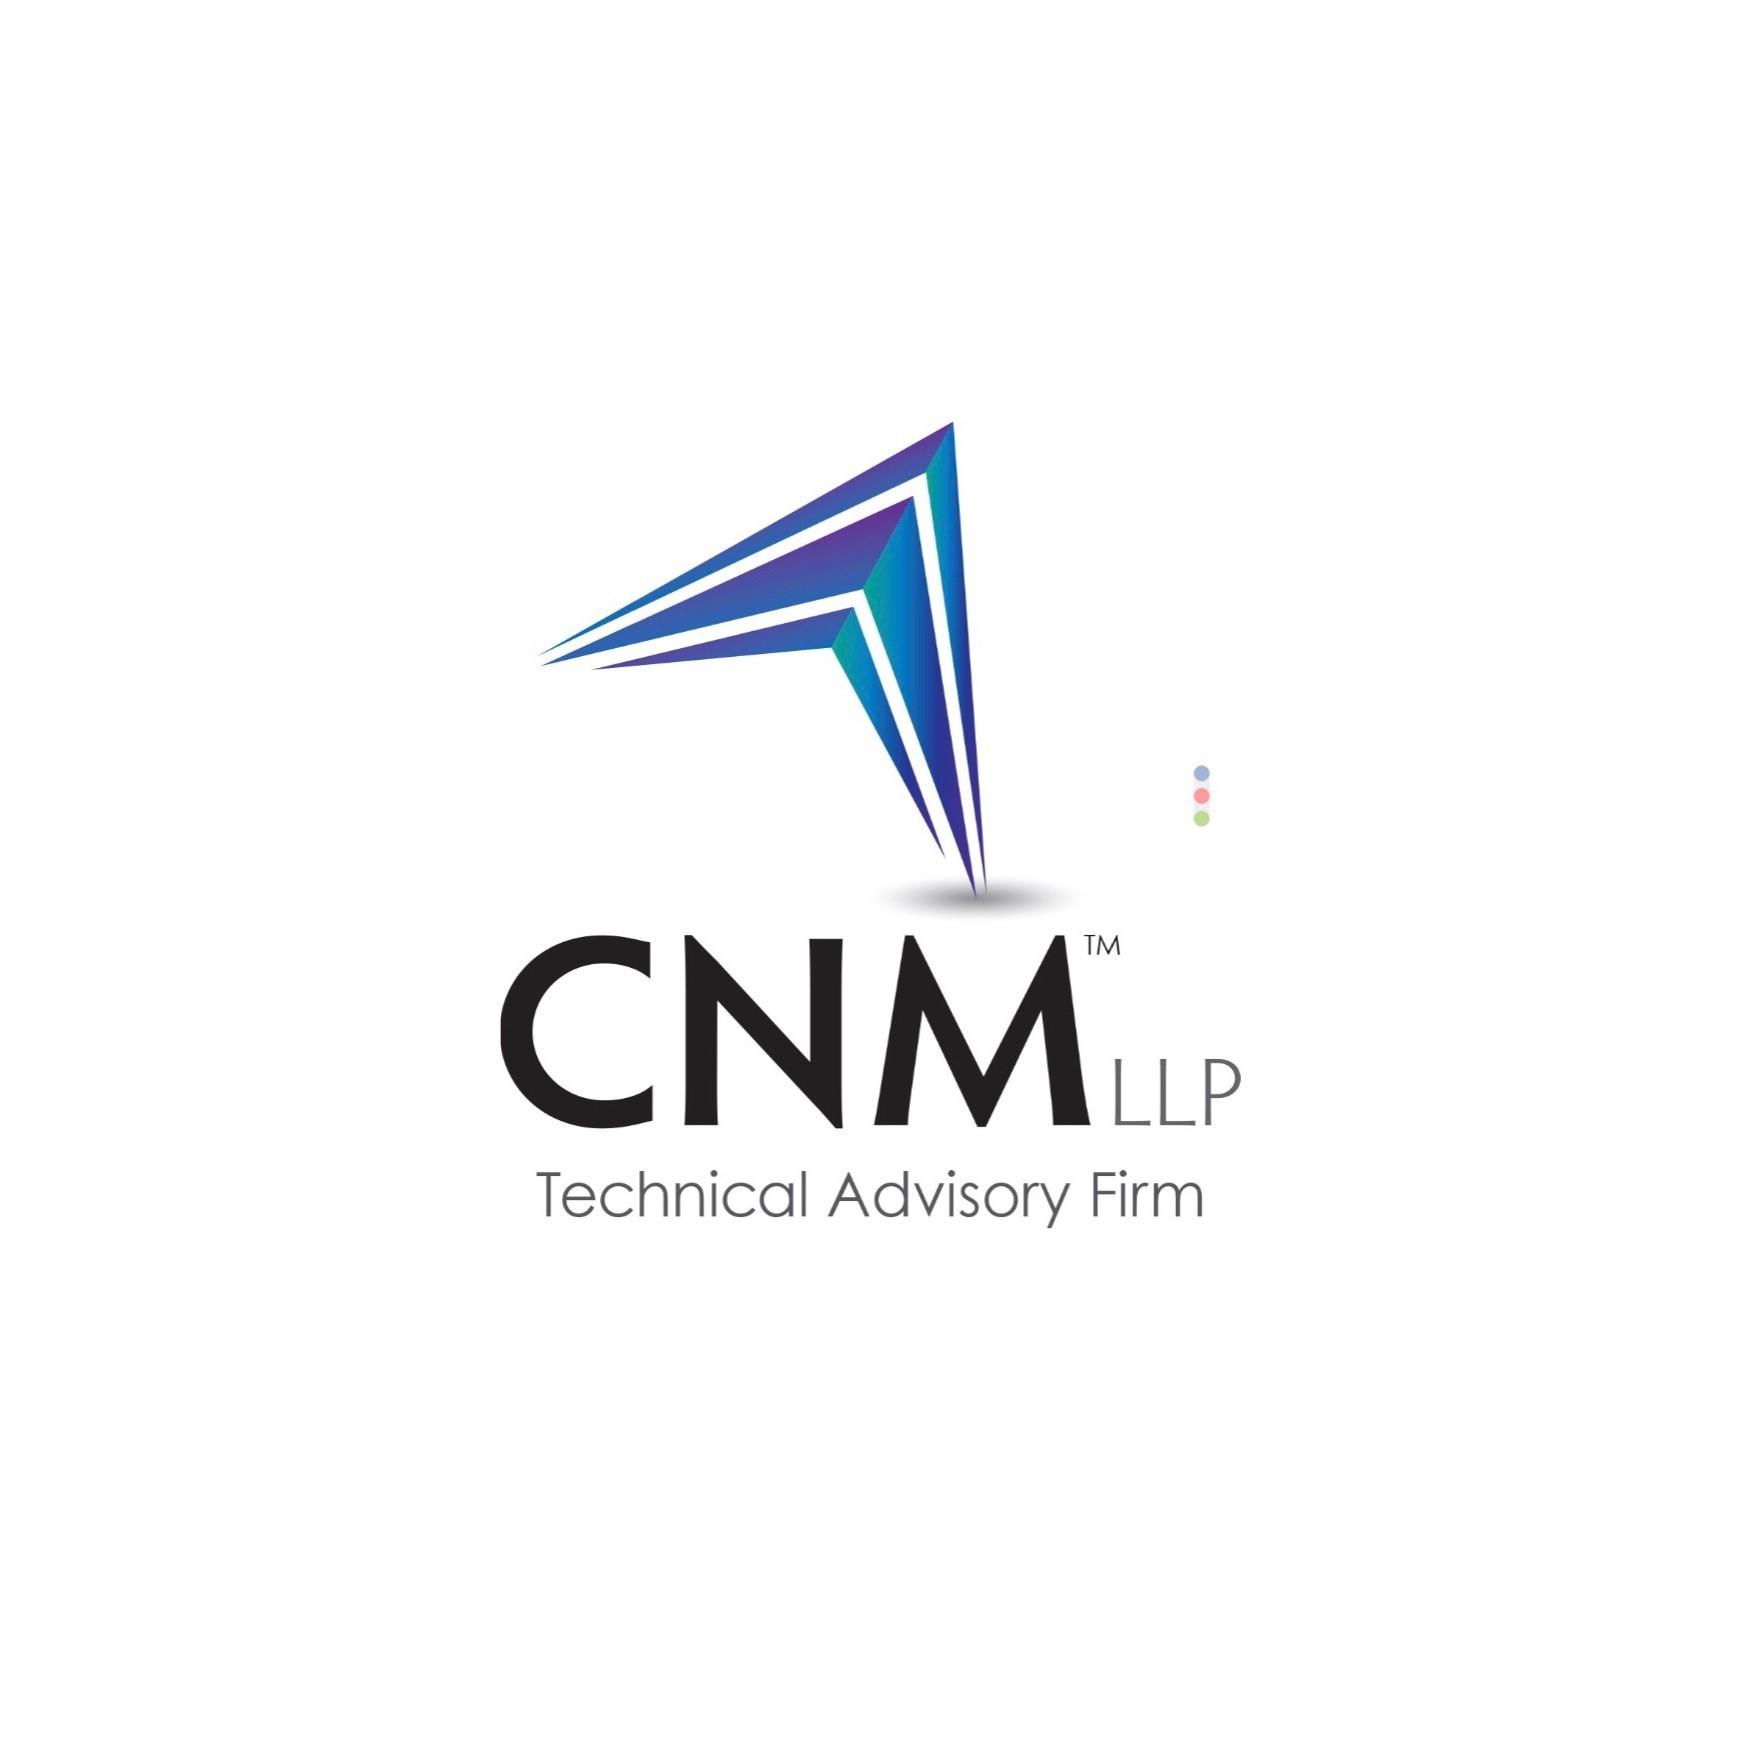 CNM LLP | LinkedIn